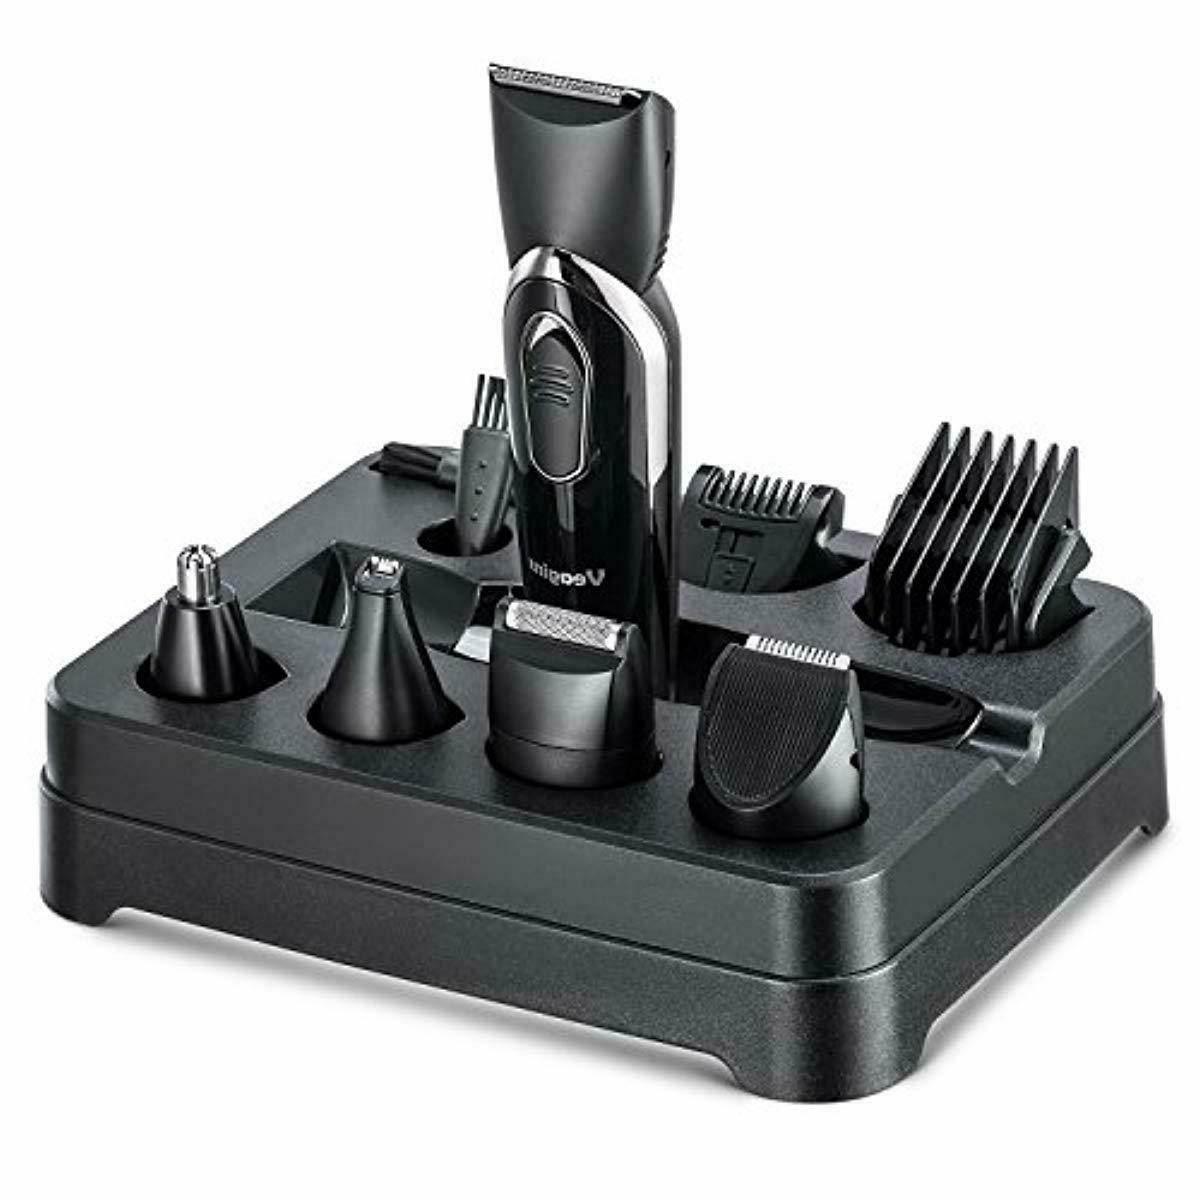 beard trimmer grooming kit cordless electric hair